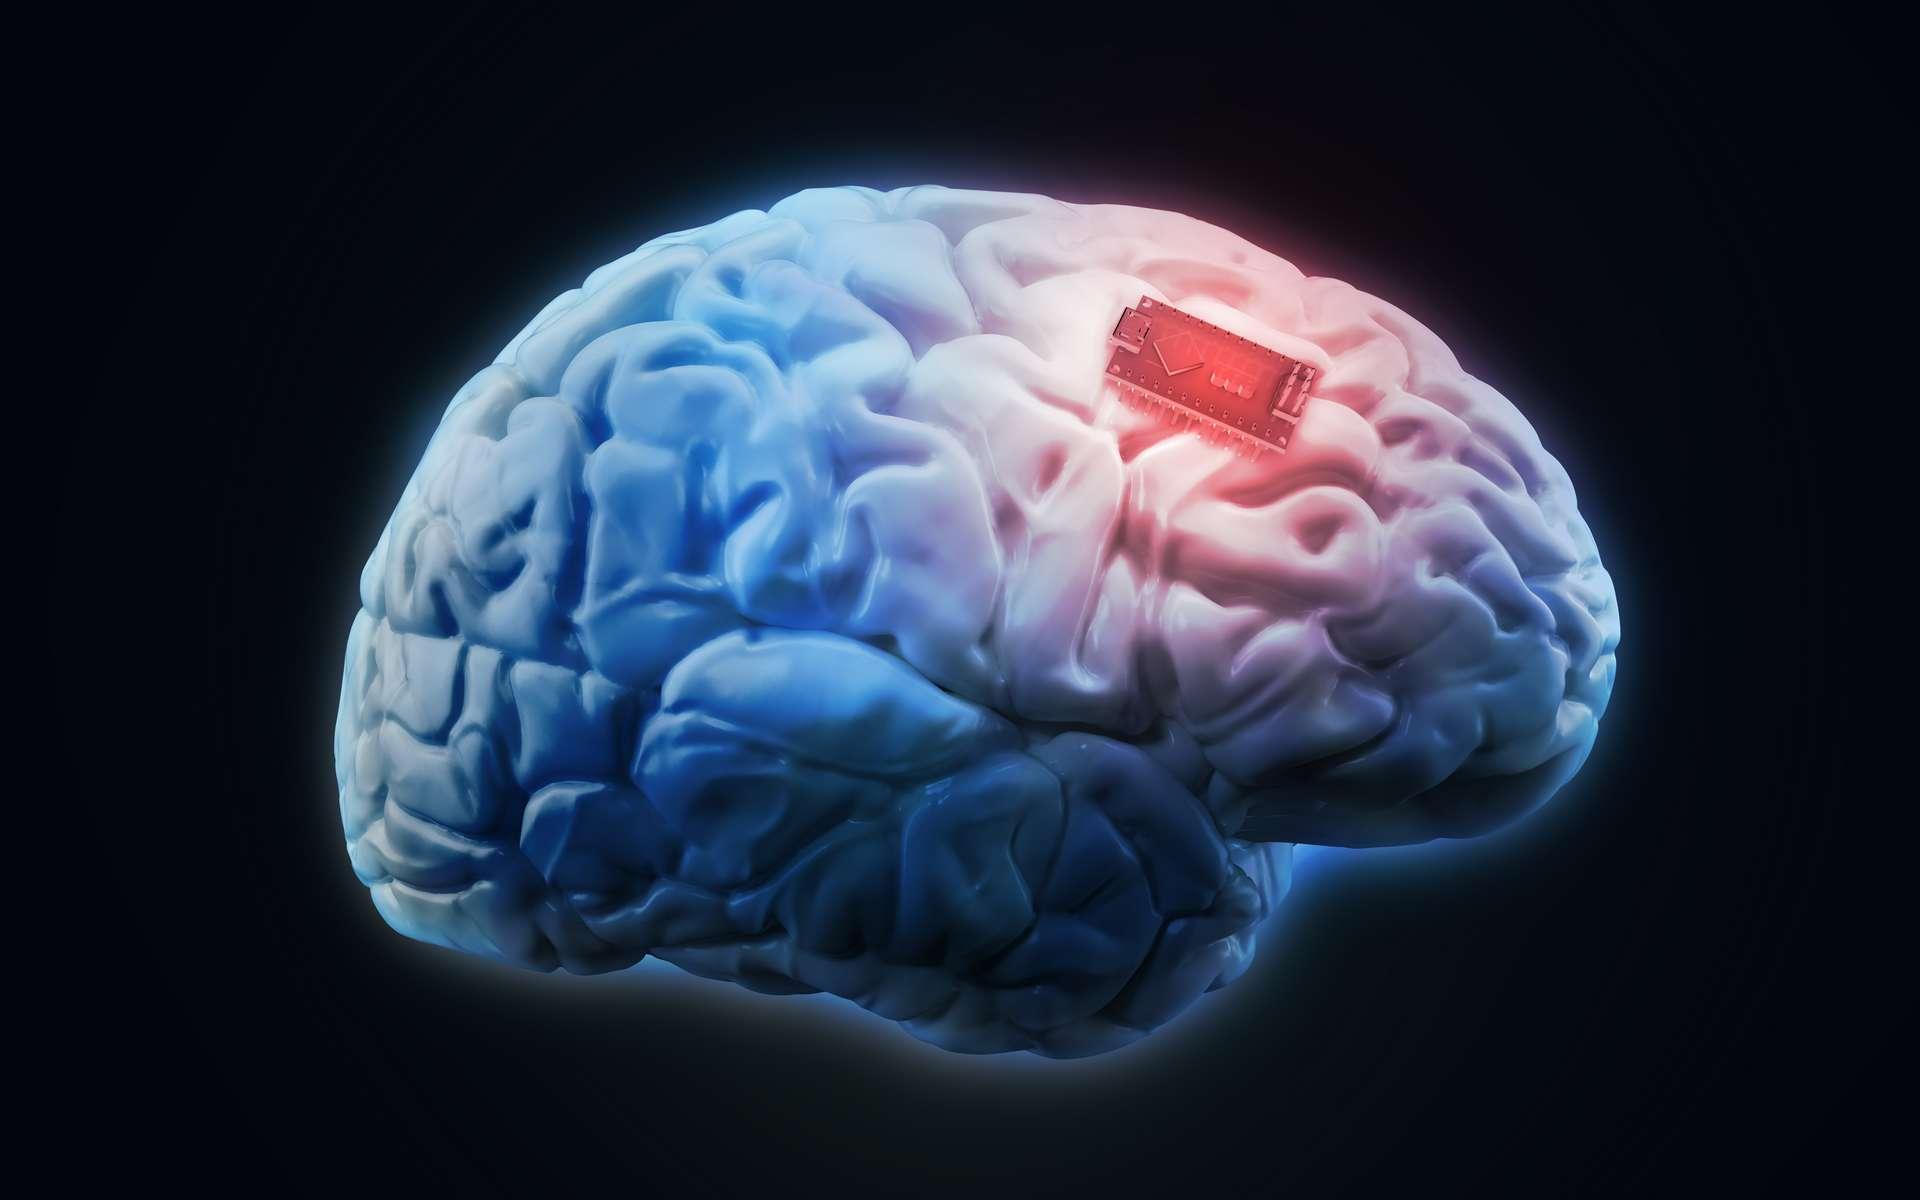 Implant connecté en bluetooth. © Mopic, Adobe Stock